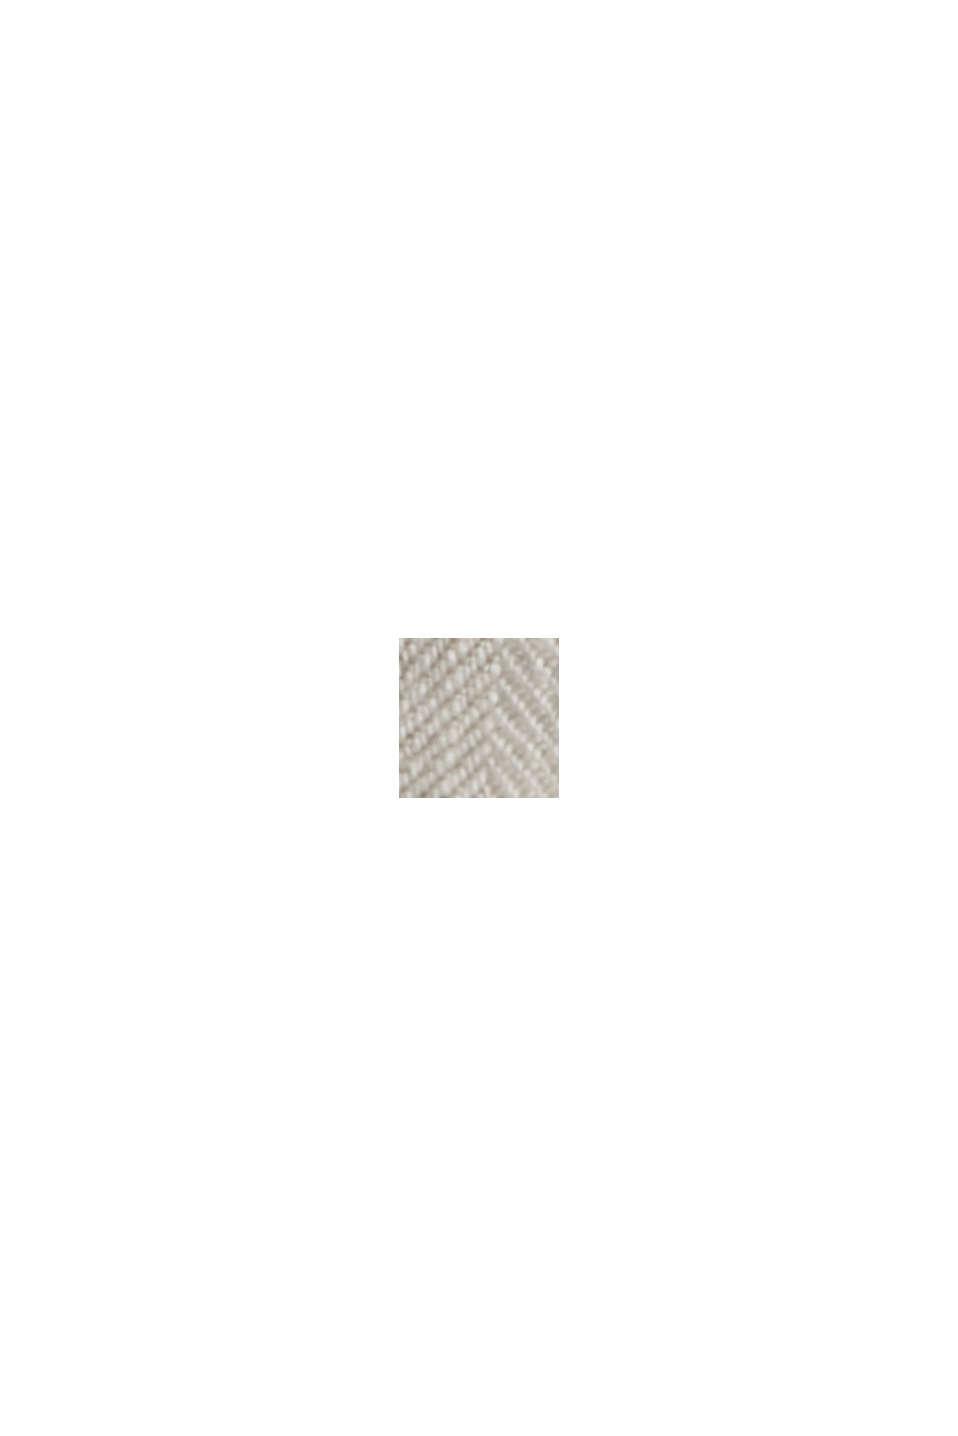 I linne: Shorts med resårlinning, OFF WHITE, swatch